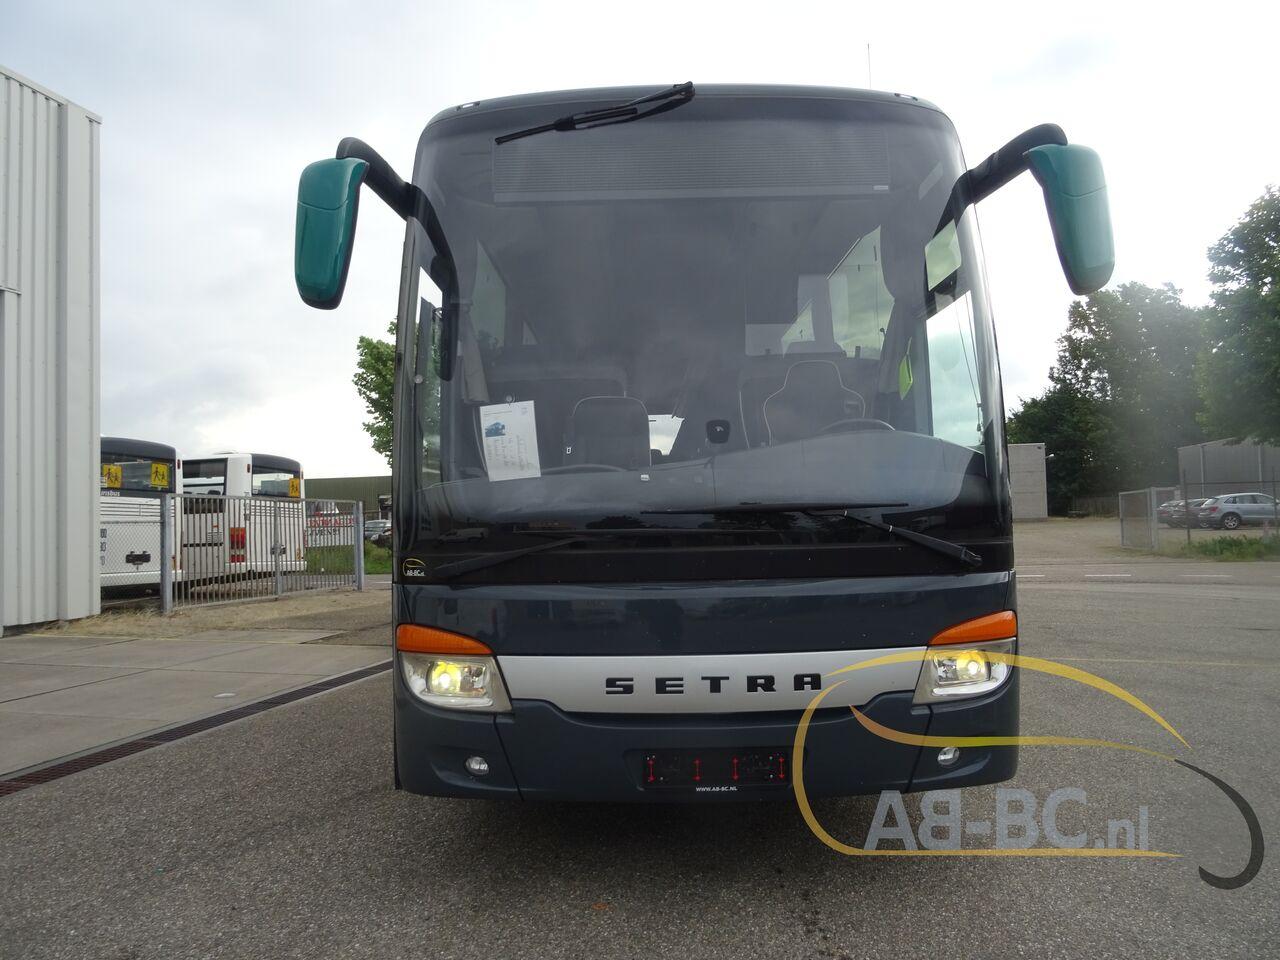 coach-busSETRA-S415-GT-HD-FINAL-EDITION---1627456969502857907_big_e71bc7de1599b49f658859ceb287cc54--21050713010665719300